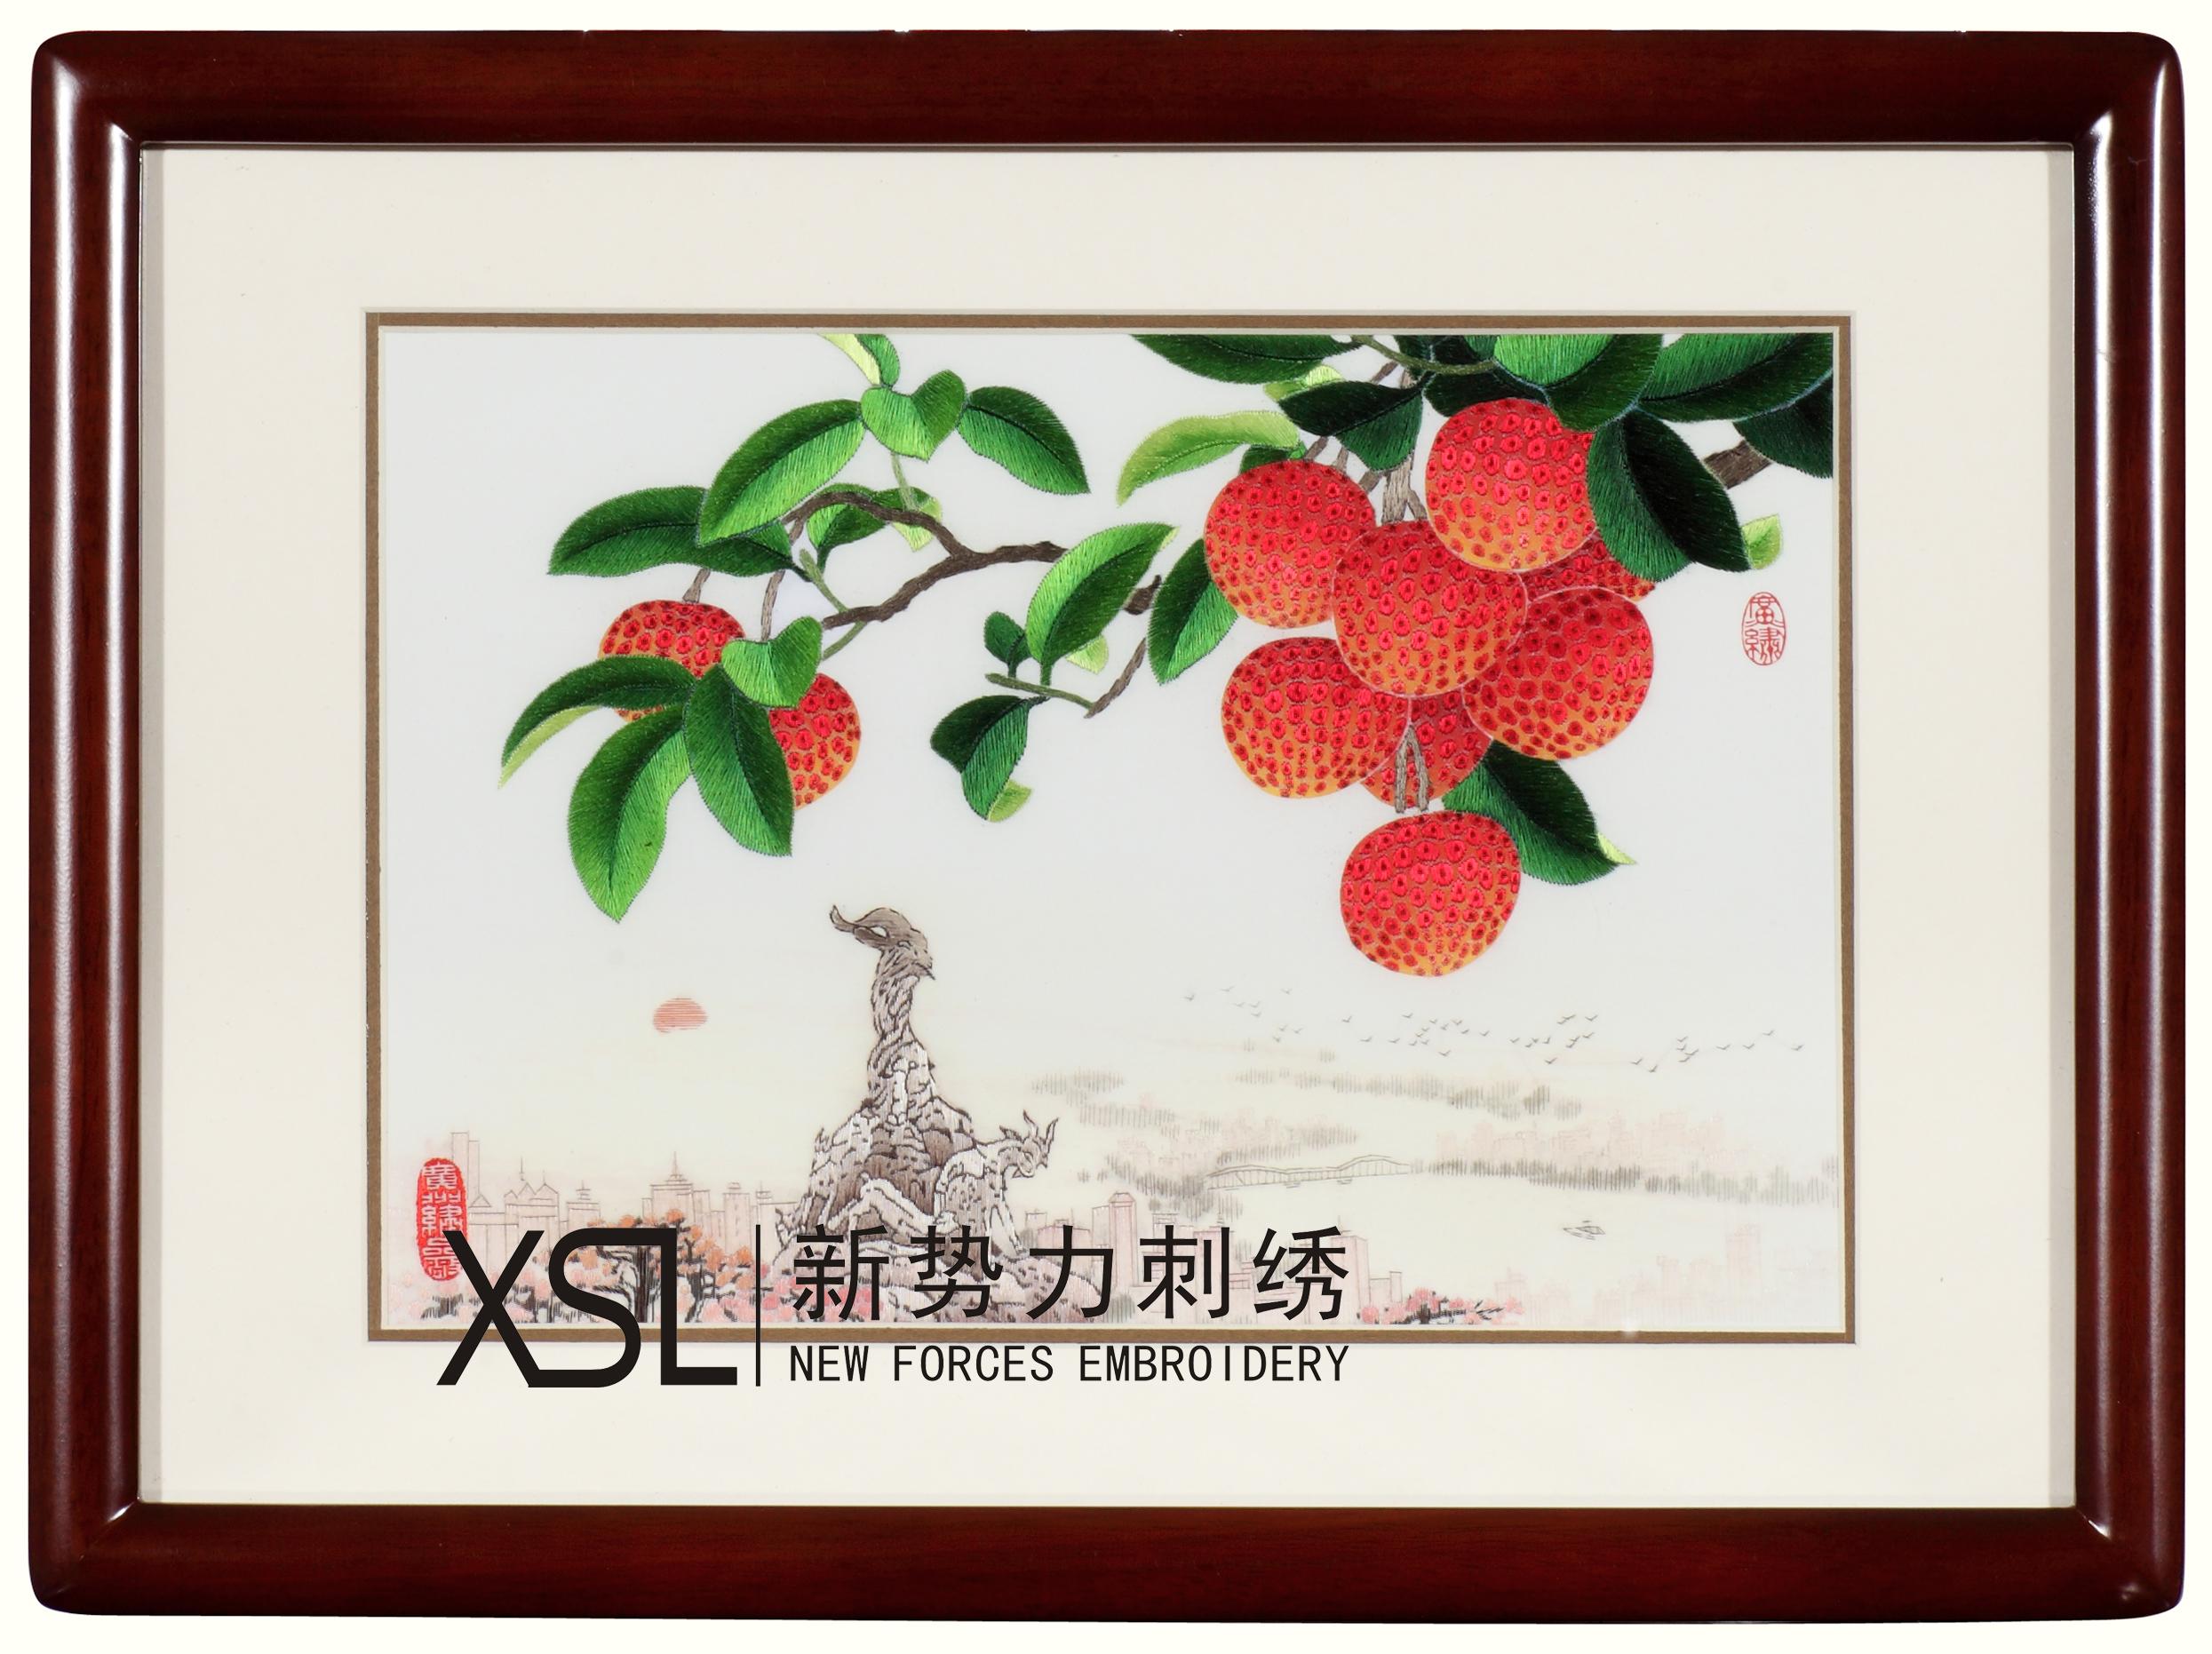 Вышивка Гуандун The Yue embroidery  28*38